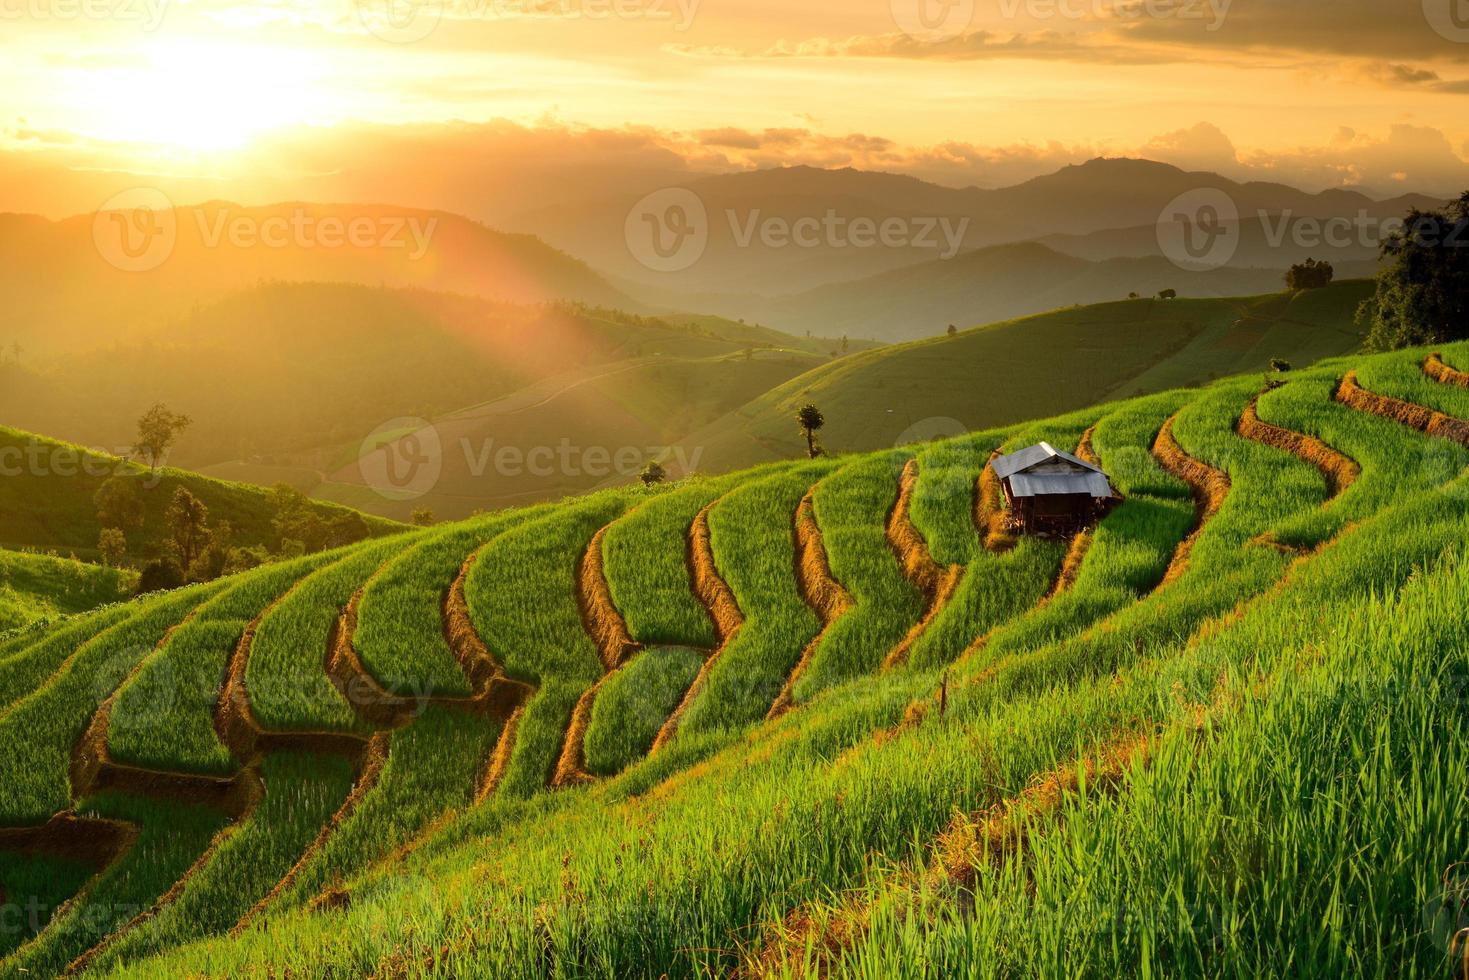 terrazze di riso con sfondo tramonto al divieto papongpieng chiangmai foto